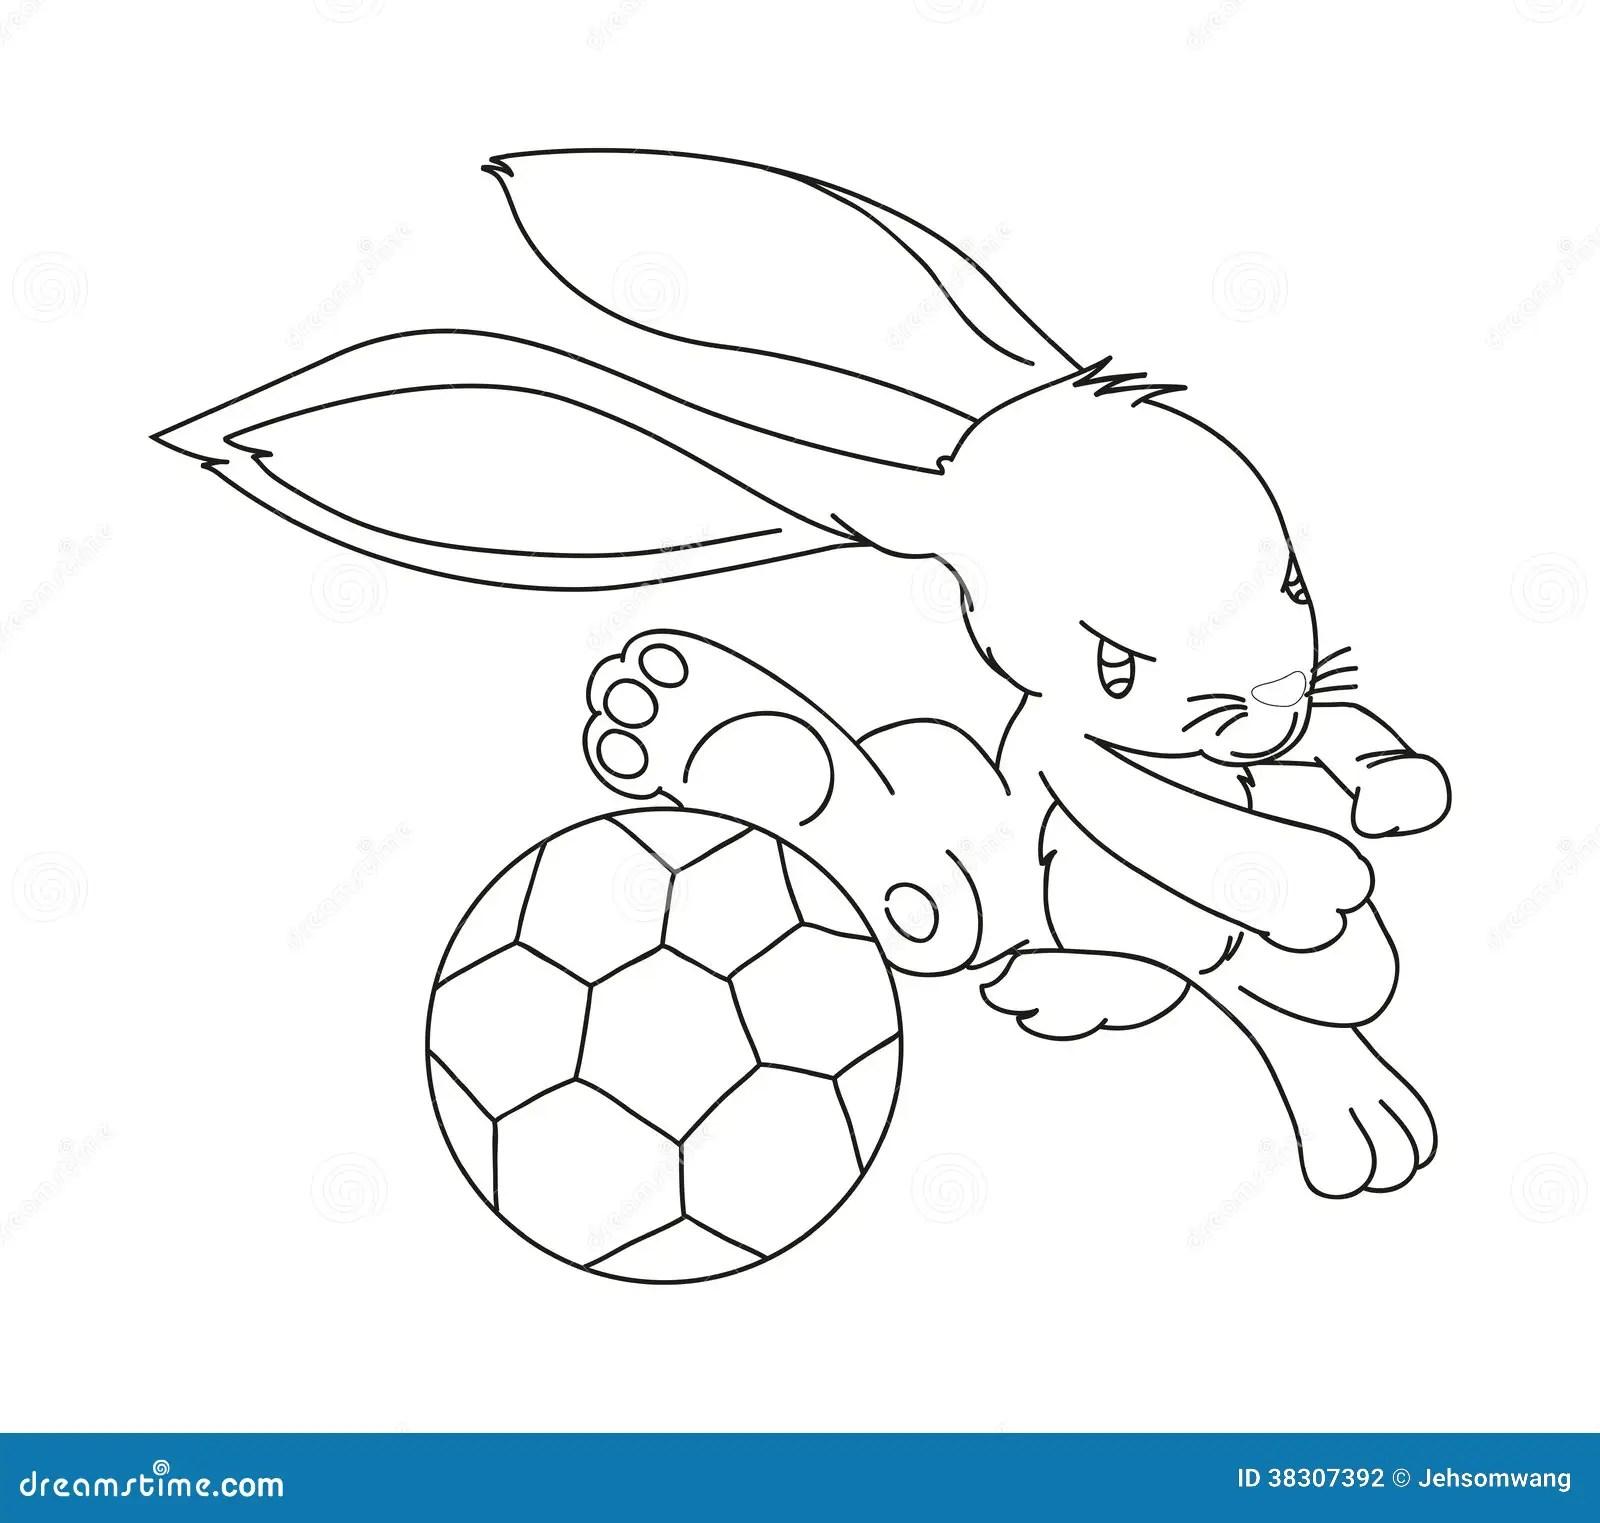 Hand Drawn Rabbit Playing Football Stock Vector